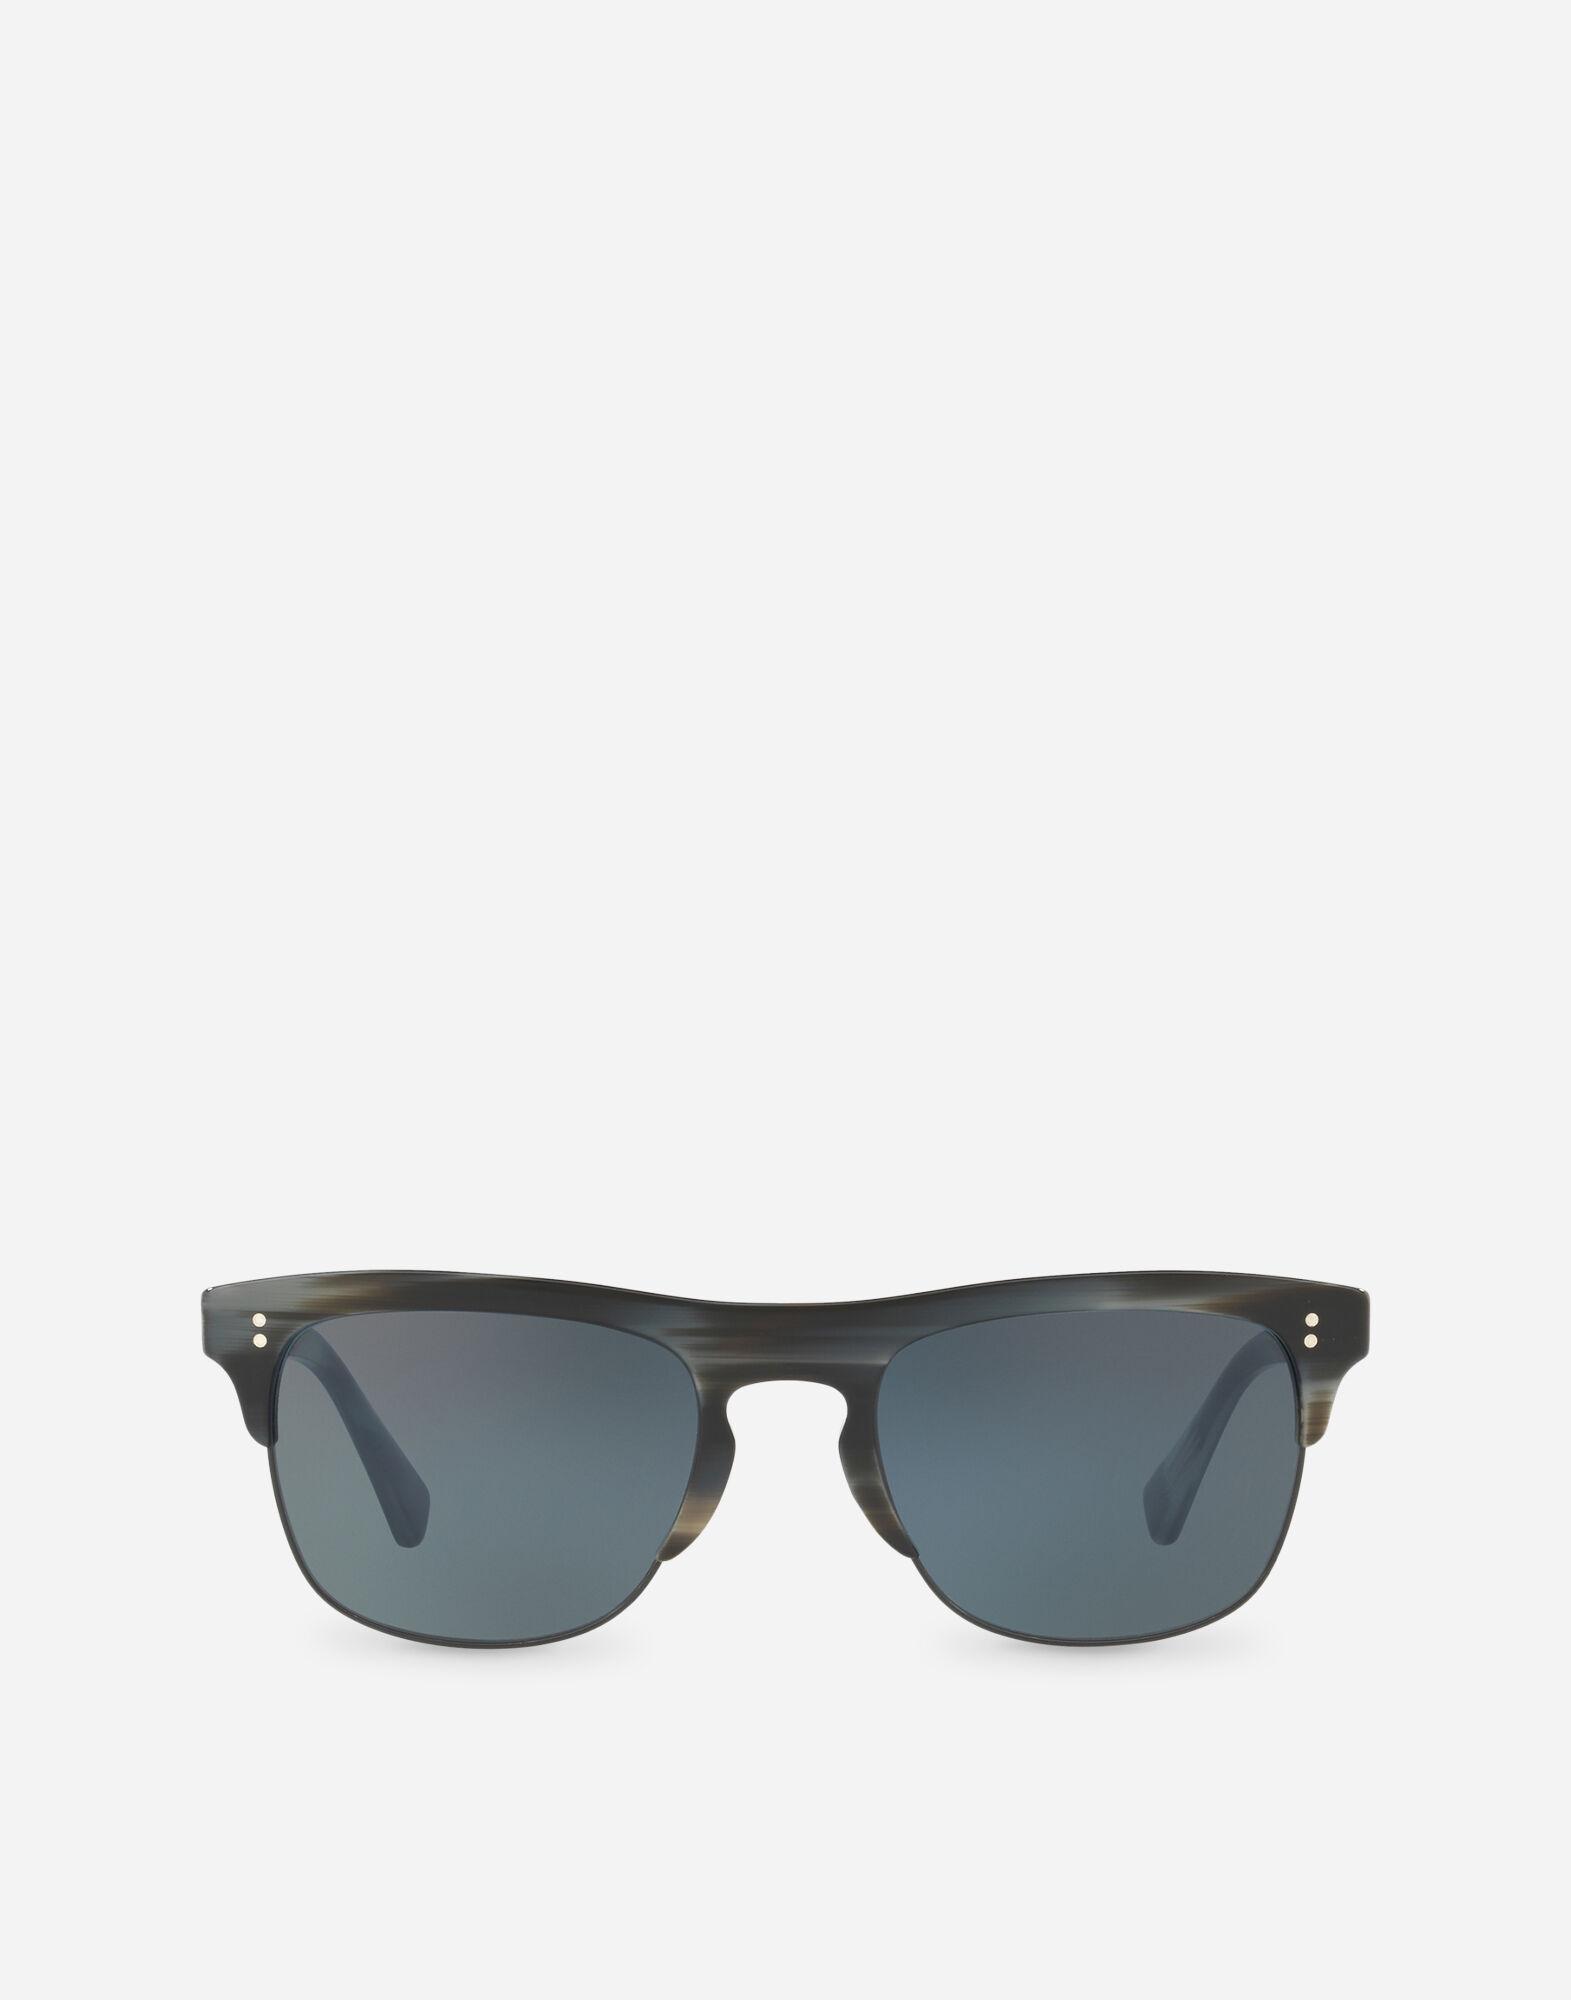 square sunglasses on2g  square sunglasses